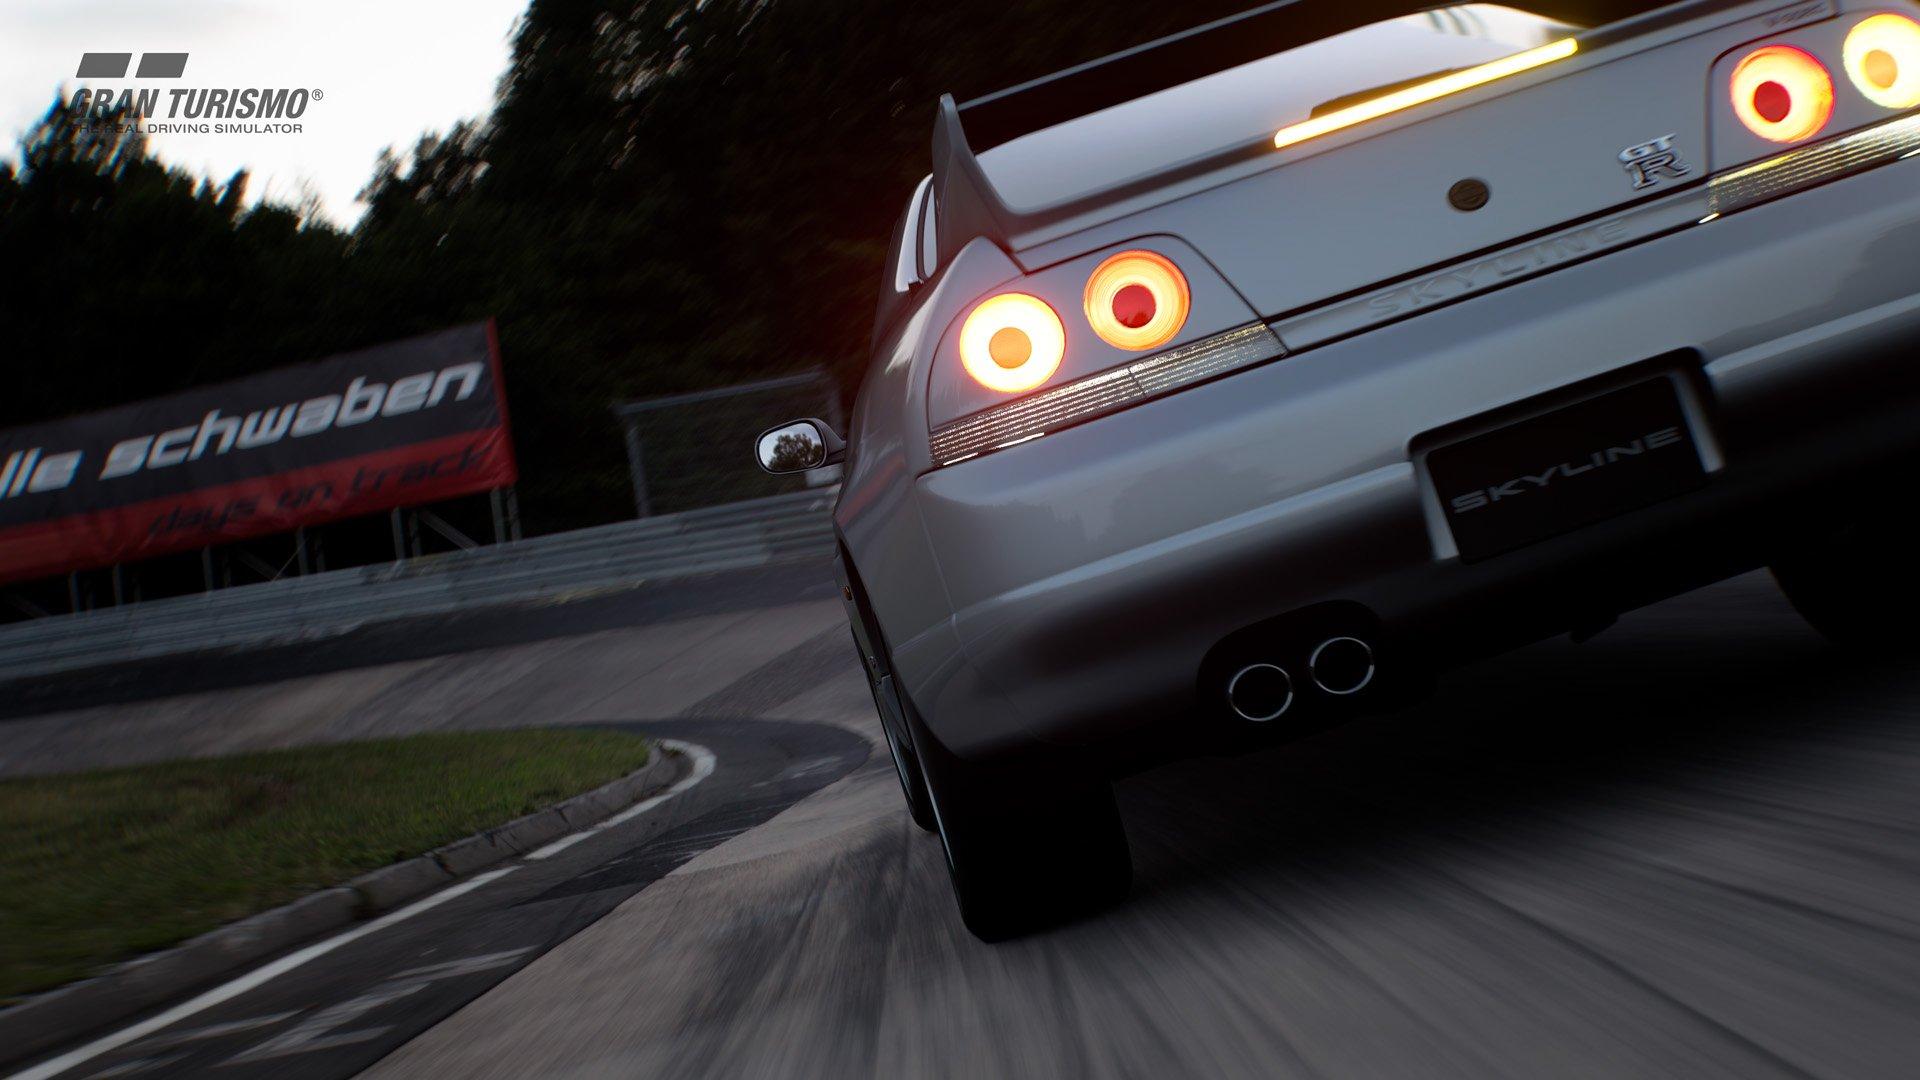 Gran Turismo Sport version 1.15 Nissan SKYLINE GT-R V-spec (R33) '97 (N300) 1